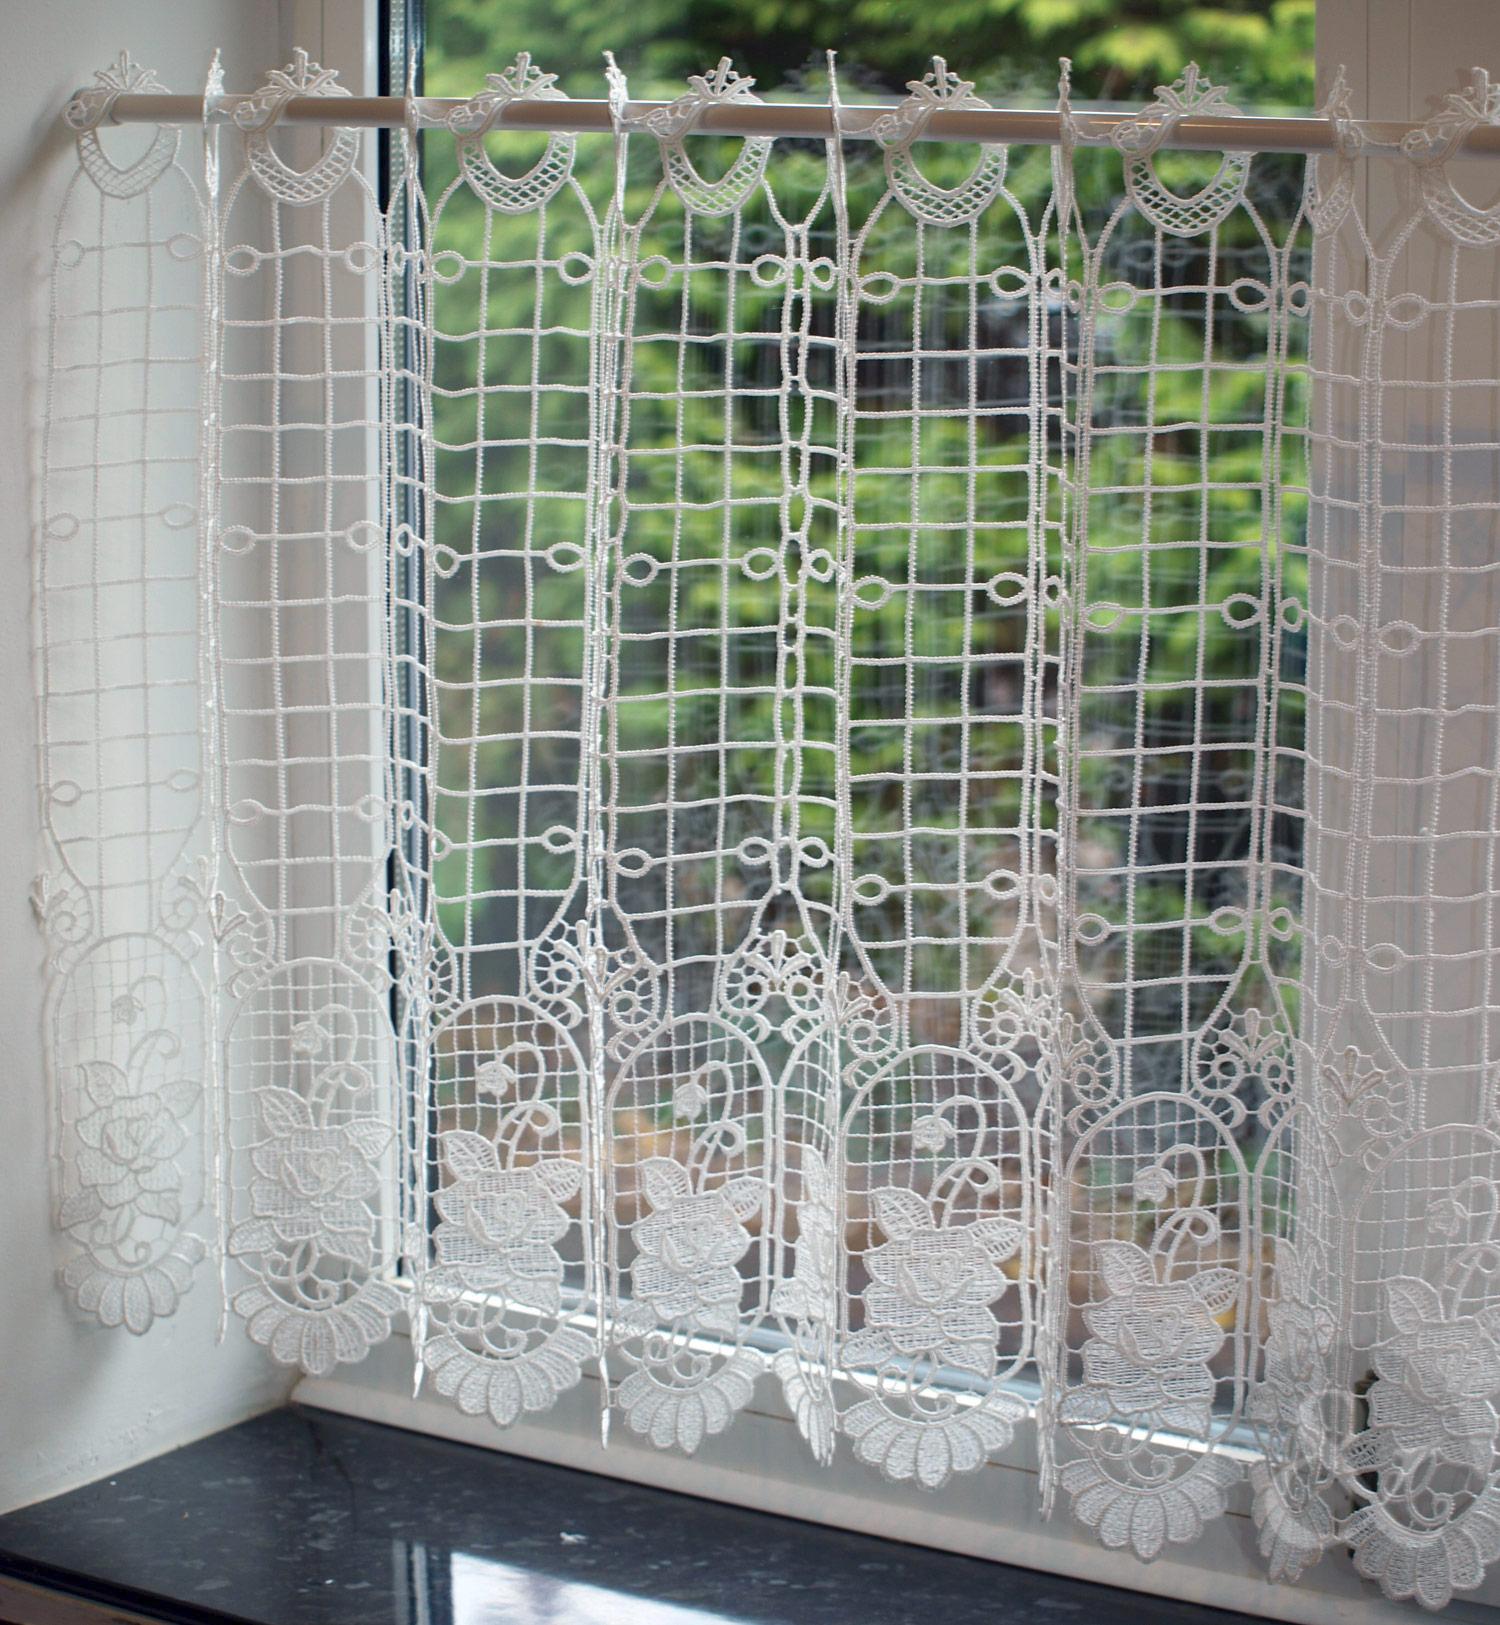 Kitchen Net Curtains: CafŽ Net Curtains - Kitchen Nets MacramŽ Ready Made Curtain Panel